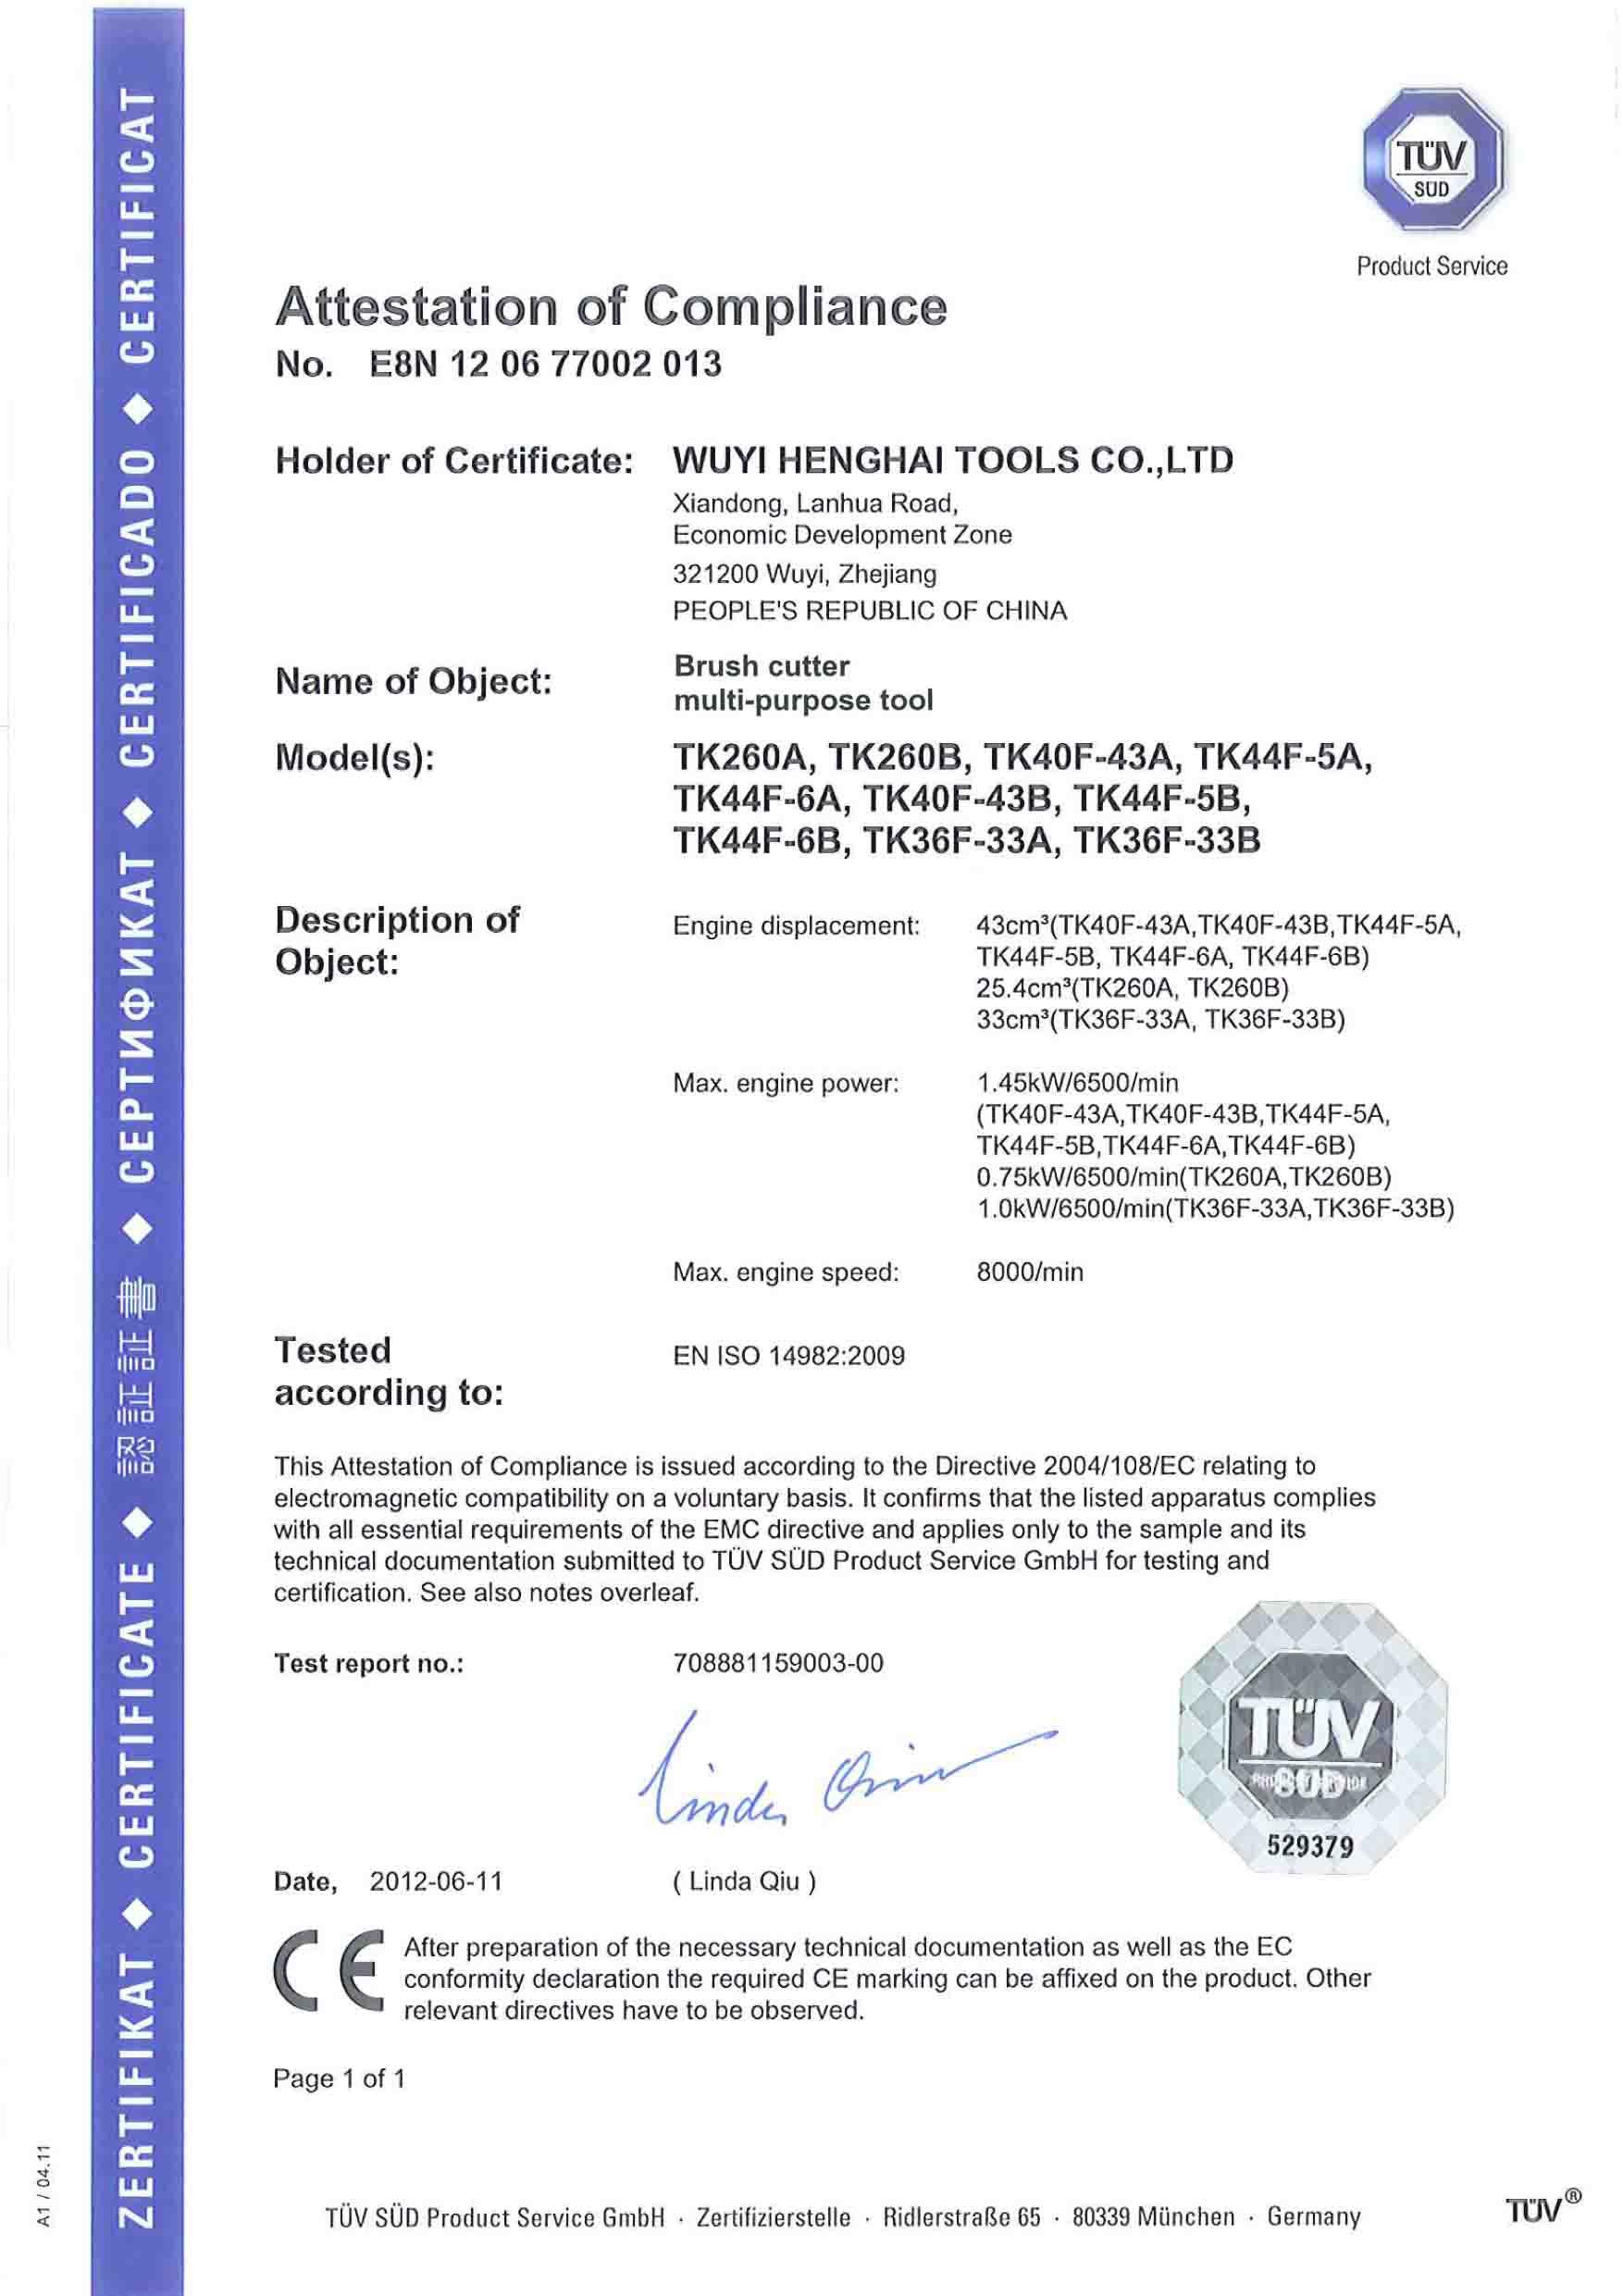 EMC certificate for brush cutter